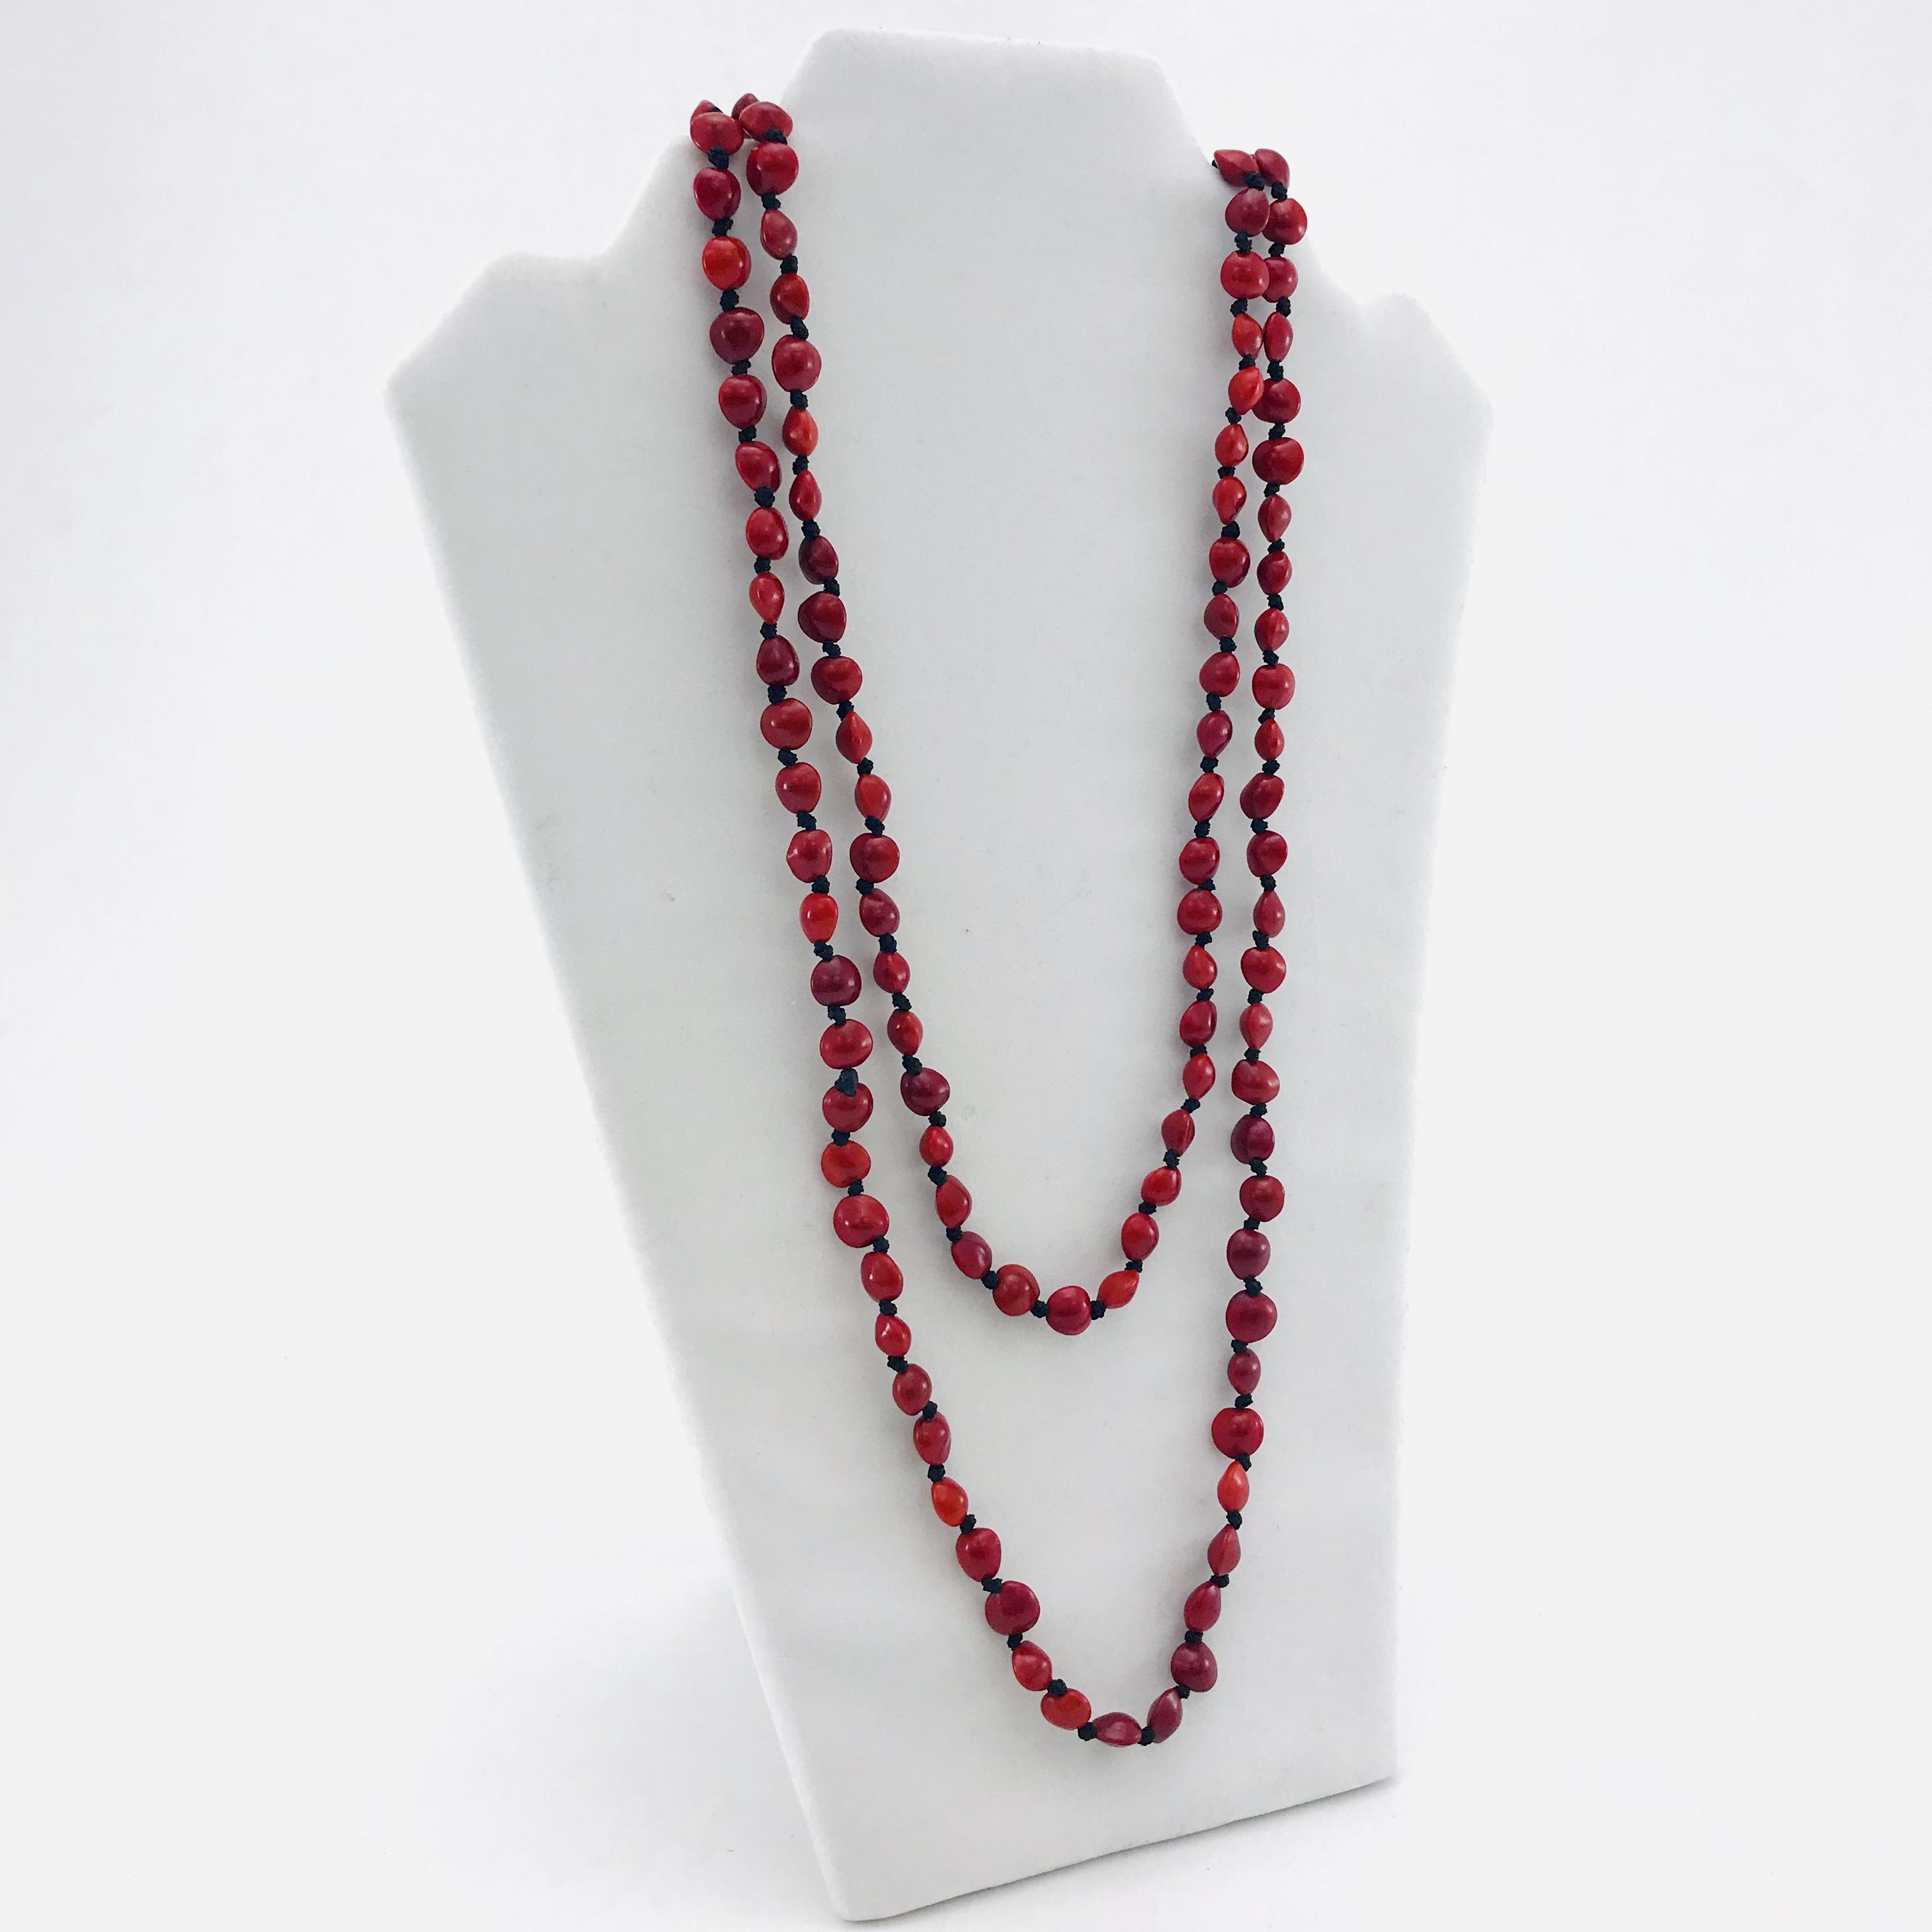 L'infini - Collier graines naturelles - 2 rangs - Rouge